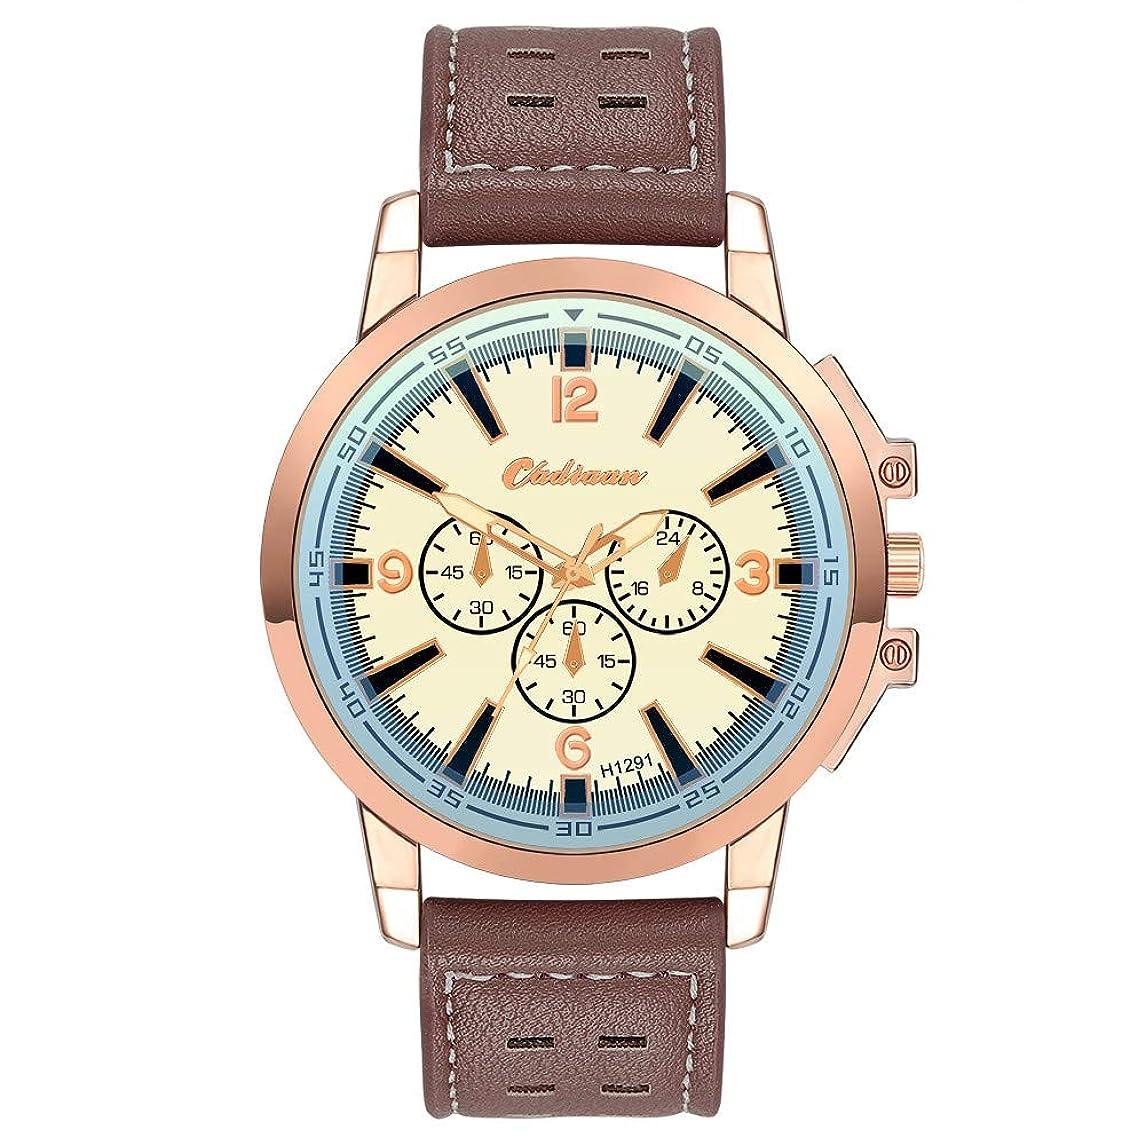 Guartz Watches for Men Digital Under 10 Dollars ? Retro Design Leather Band Analog Alloy Quartz Wrist Watch